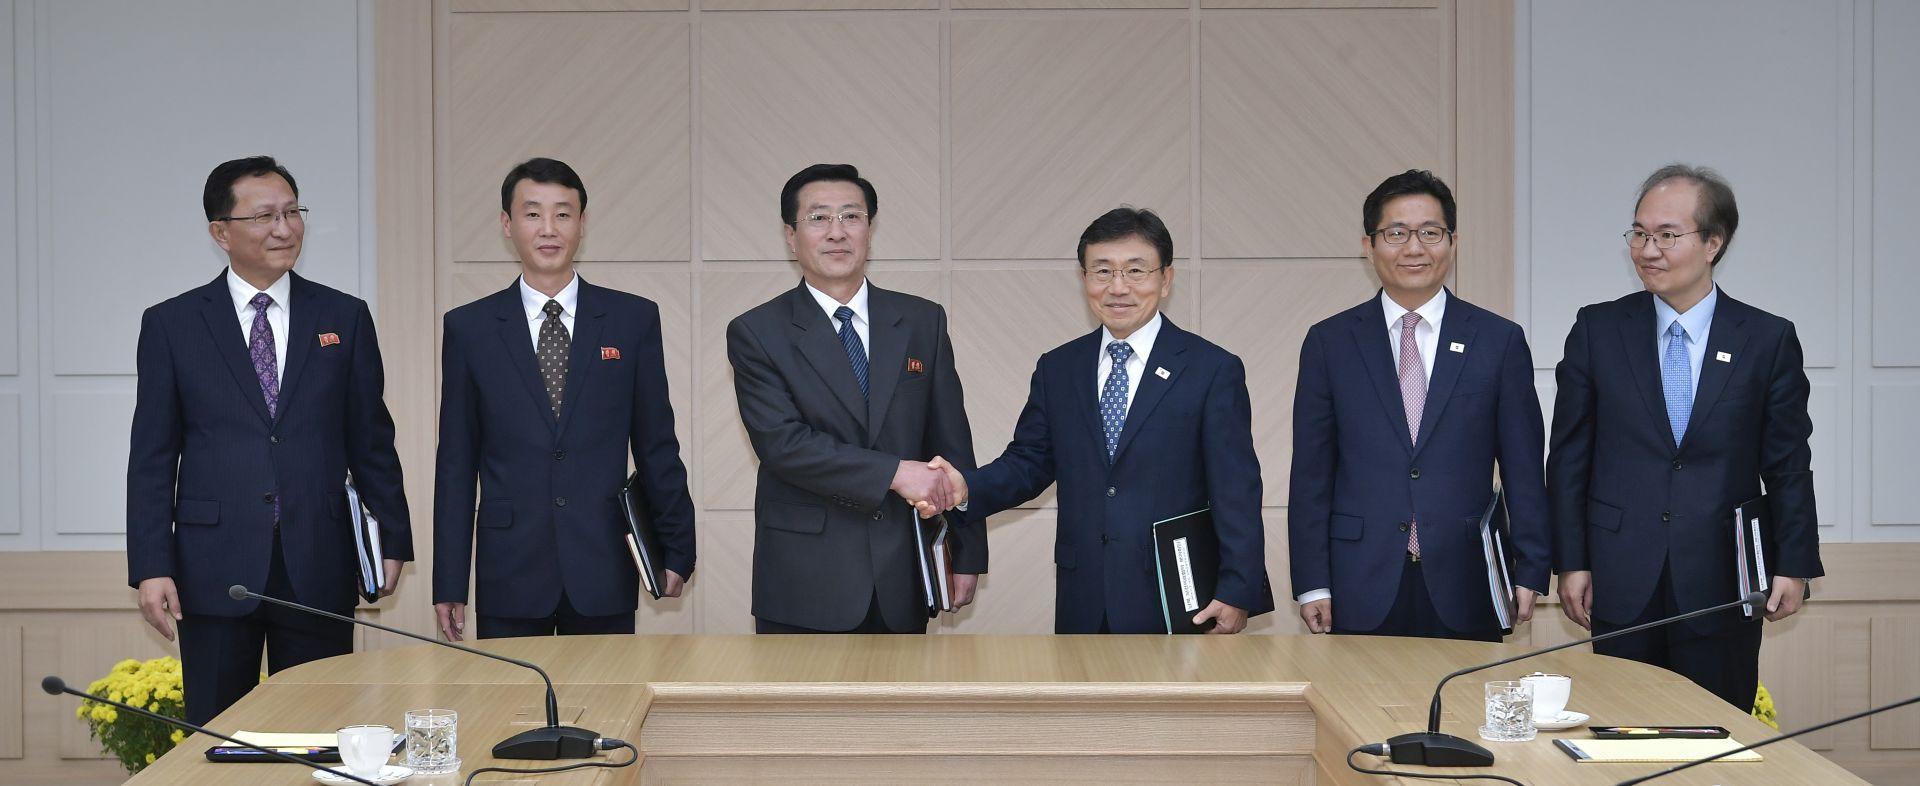 Sjeverna i Južna Koreja povukle vojnike